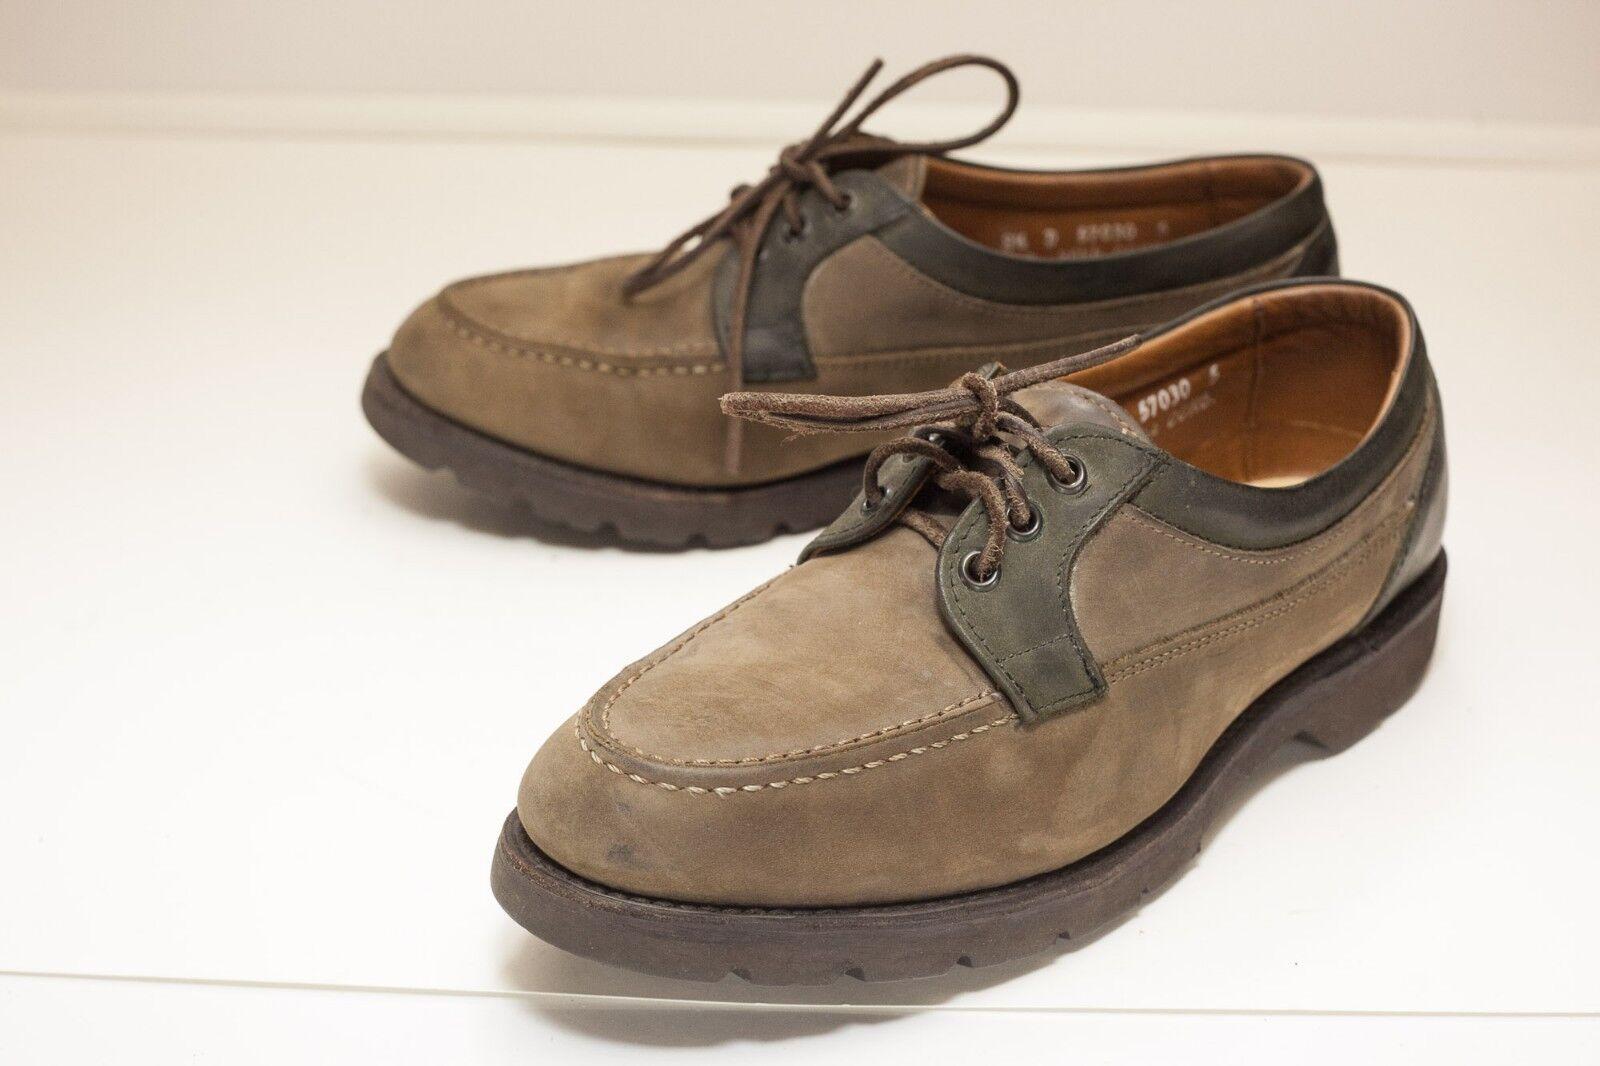 Scarpe casual da uomo  Allen Edmonds 8.5 D Brown Casual Shoes - Missing Insoles.